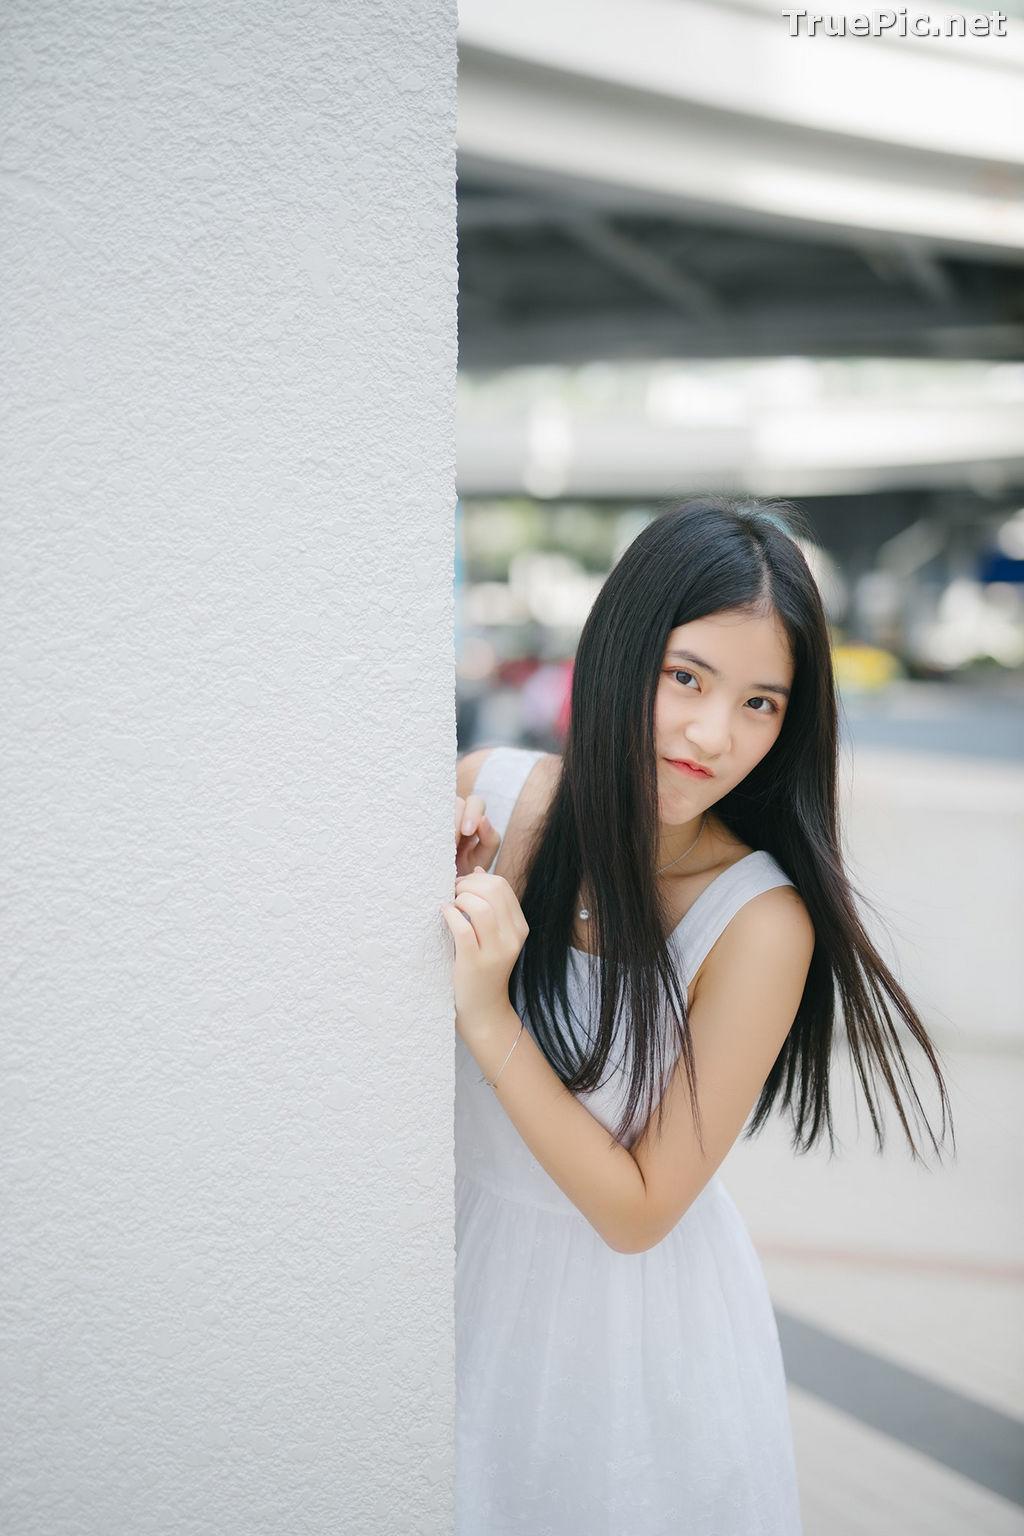 Image Thailand Model - Venita Loywattanakul - A Beautiful White - TruePic.net - Picture-1